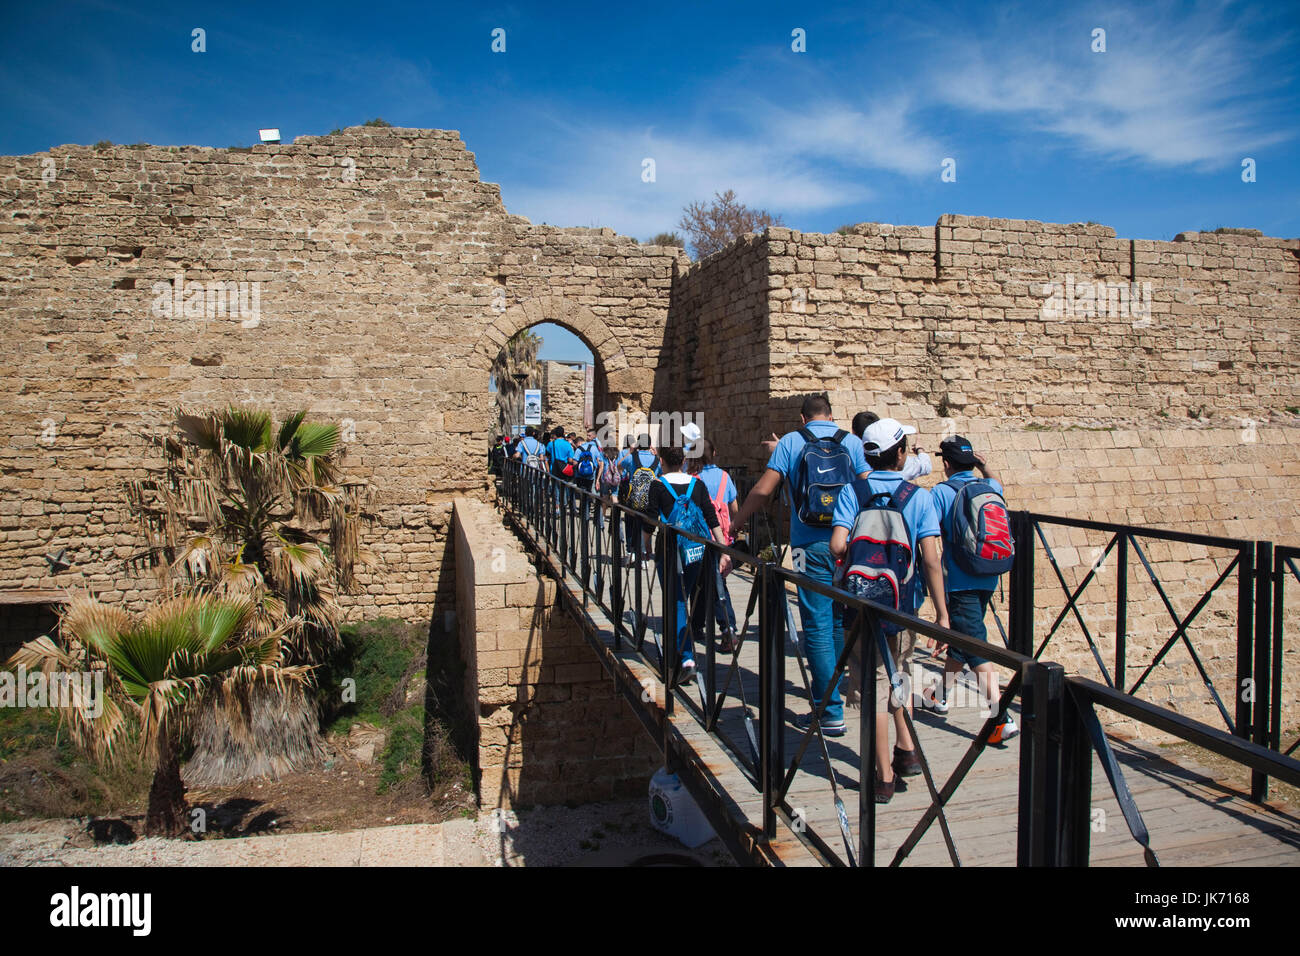 Israel, North Coast, Caesarea ruins of port built by Herod the Great in 22 BC, schoolchildren, NR - Stock Image